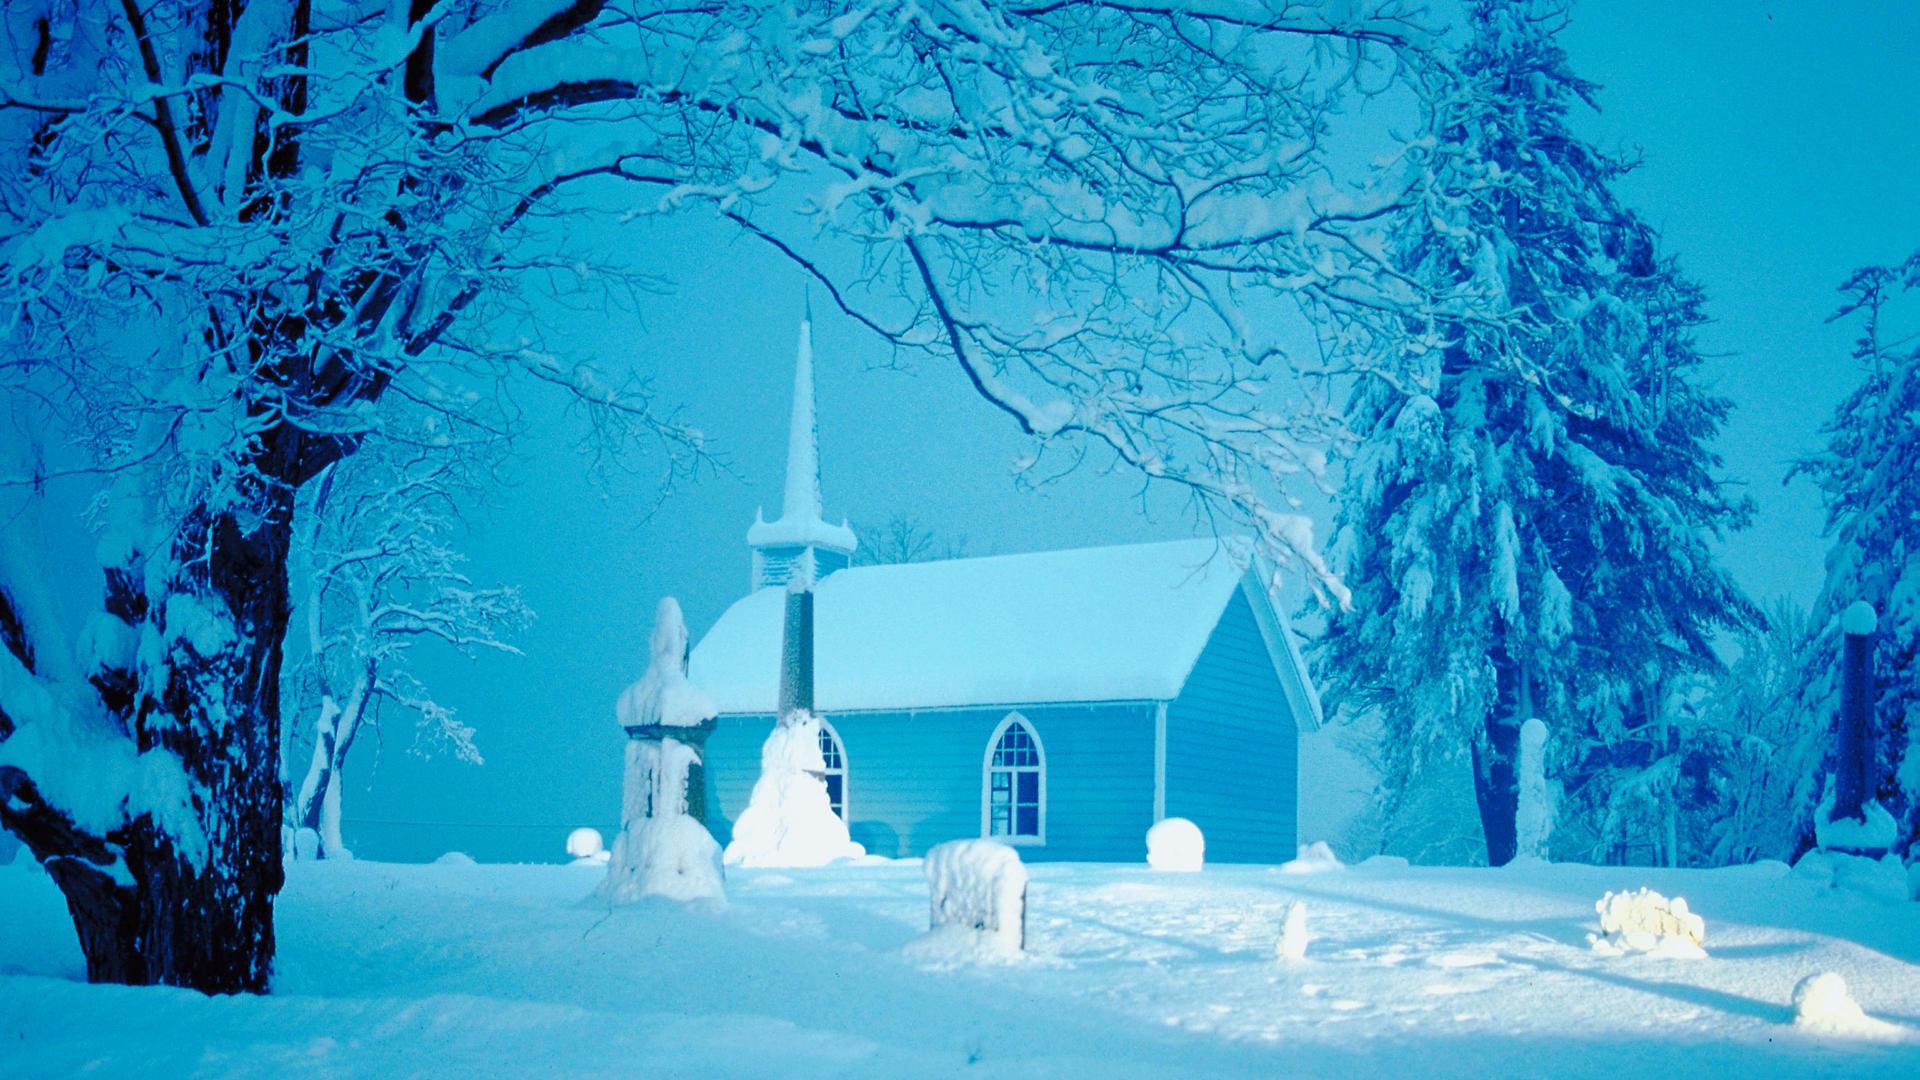 Beautiful Winter Landscapes Amazing Scenery Pinterest | HD Wallpapers |  Pinterest | Snow scenes, Wallpaper and Winter landscape